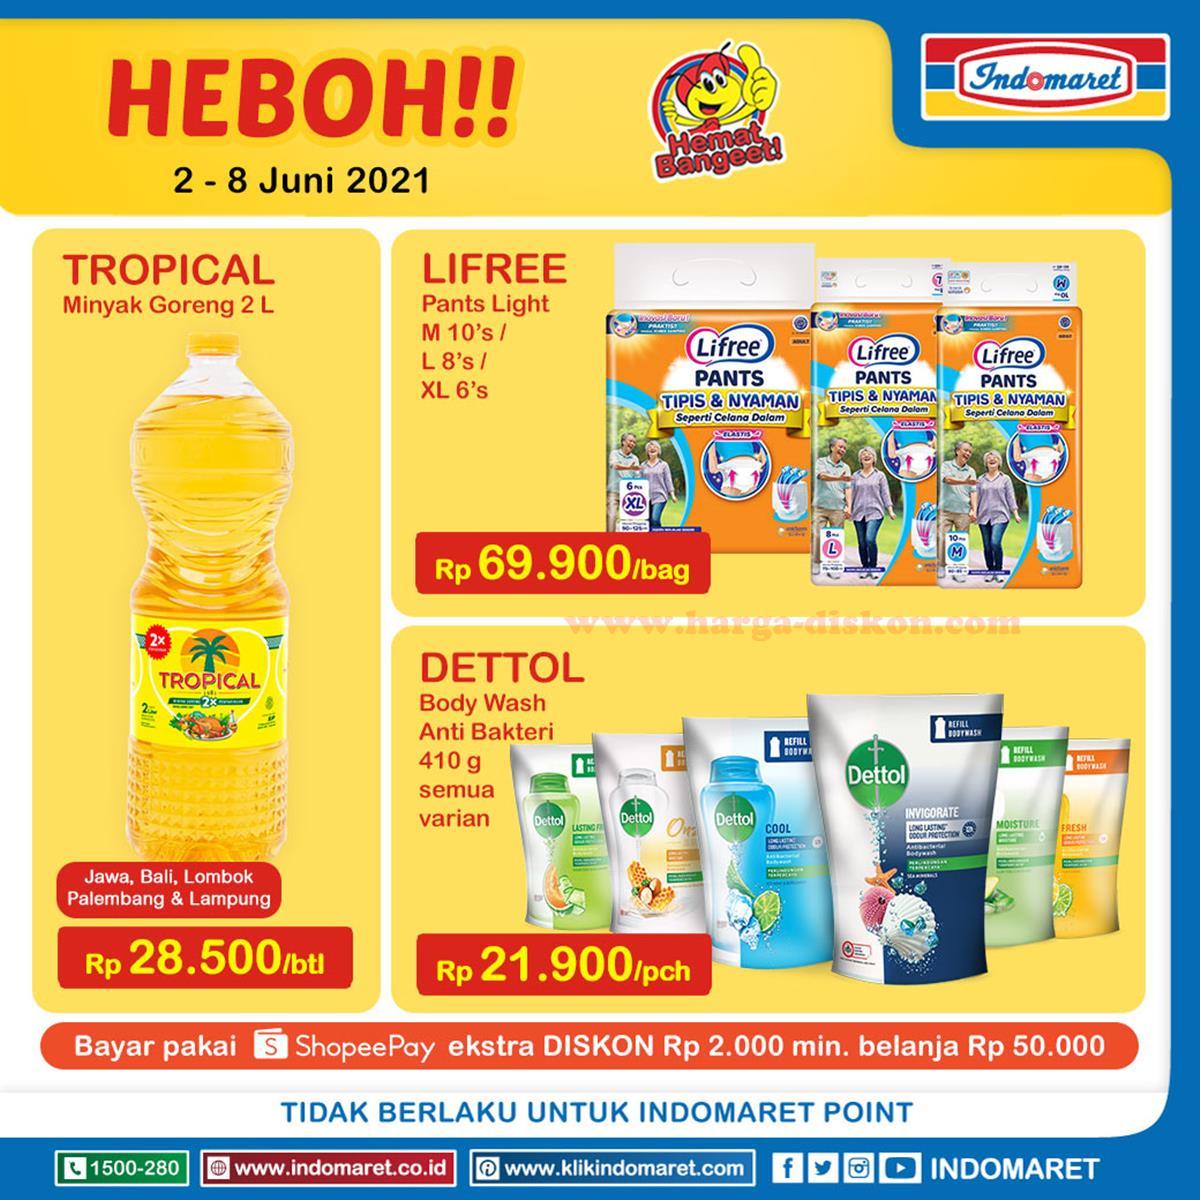 Promo INDOMARET Heboh, Product of The Week 02 - 08 Juni 2021